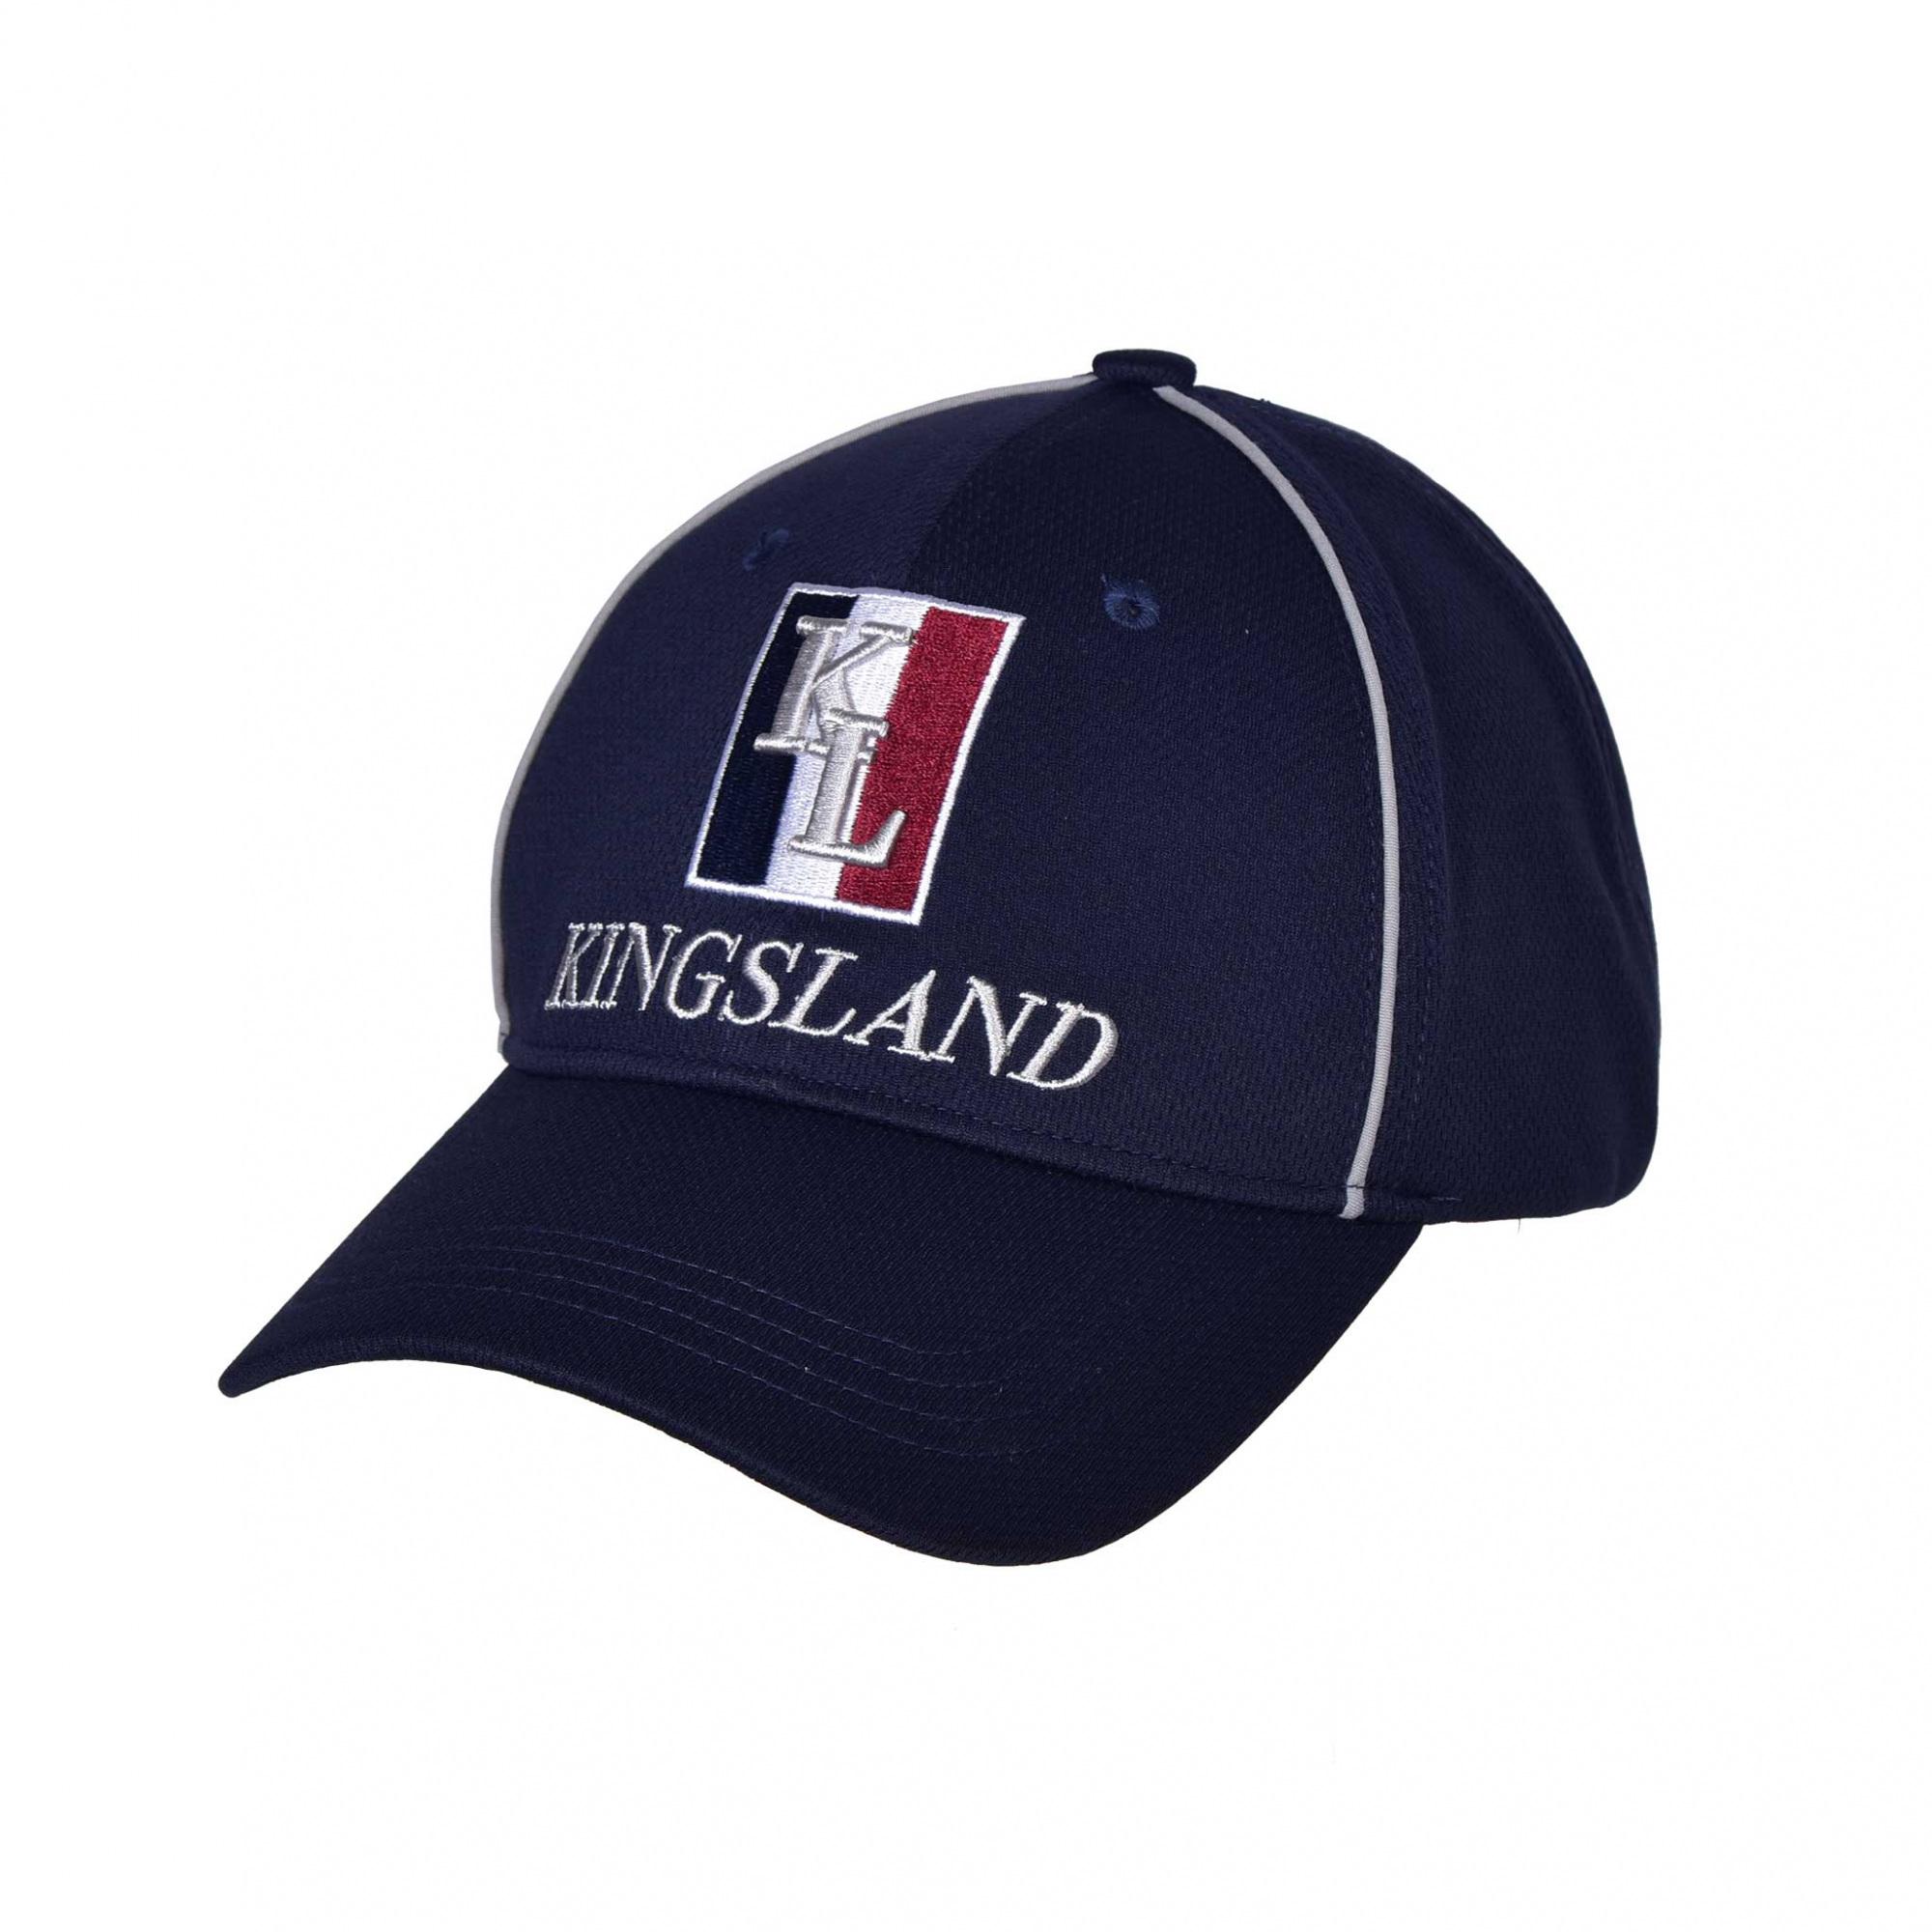 Kingsland Lupe Unisex Cap